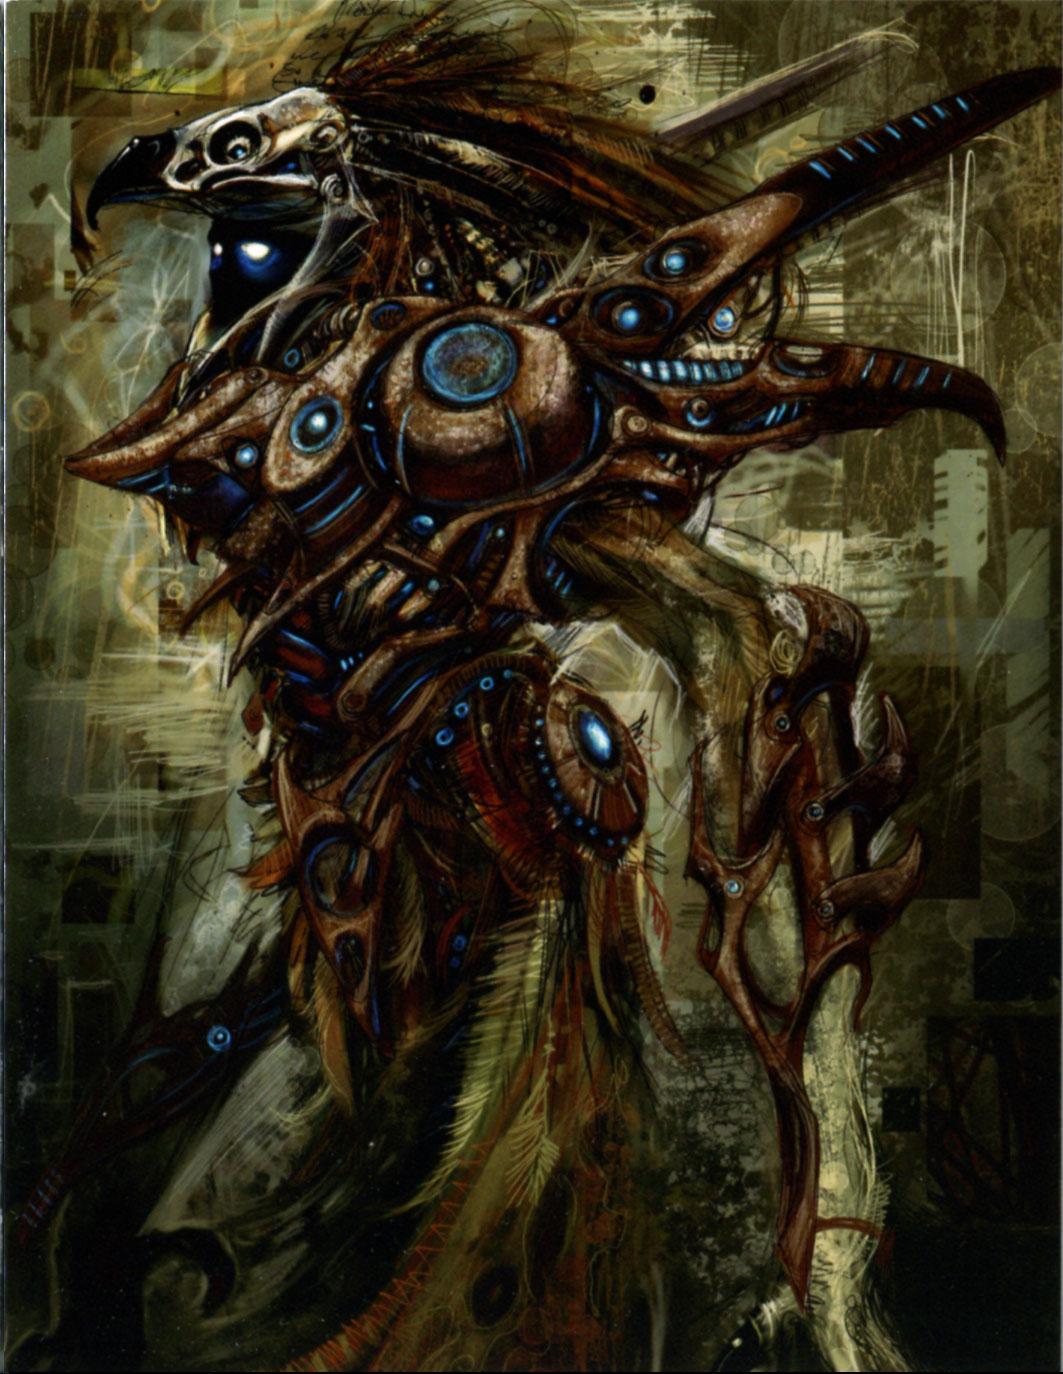 Metroid Prime Trilogy art booklet